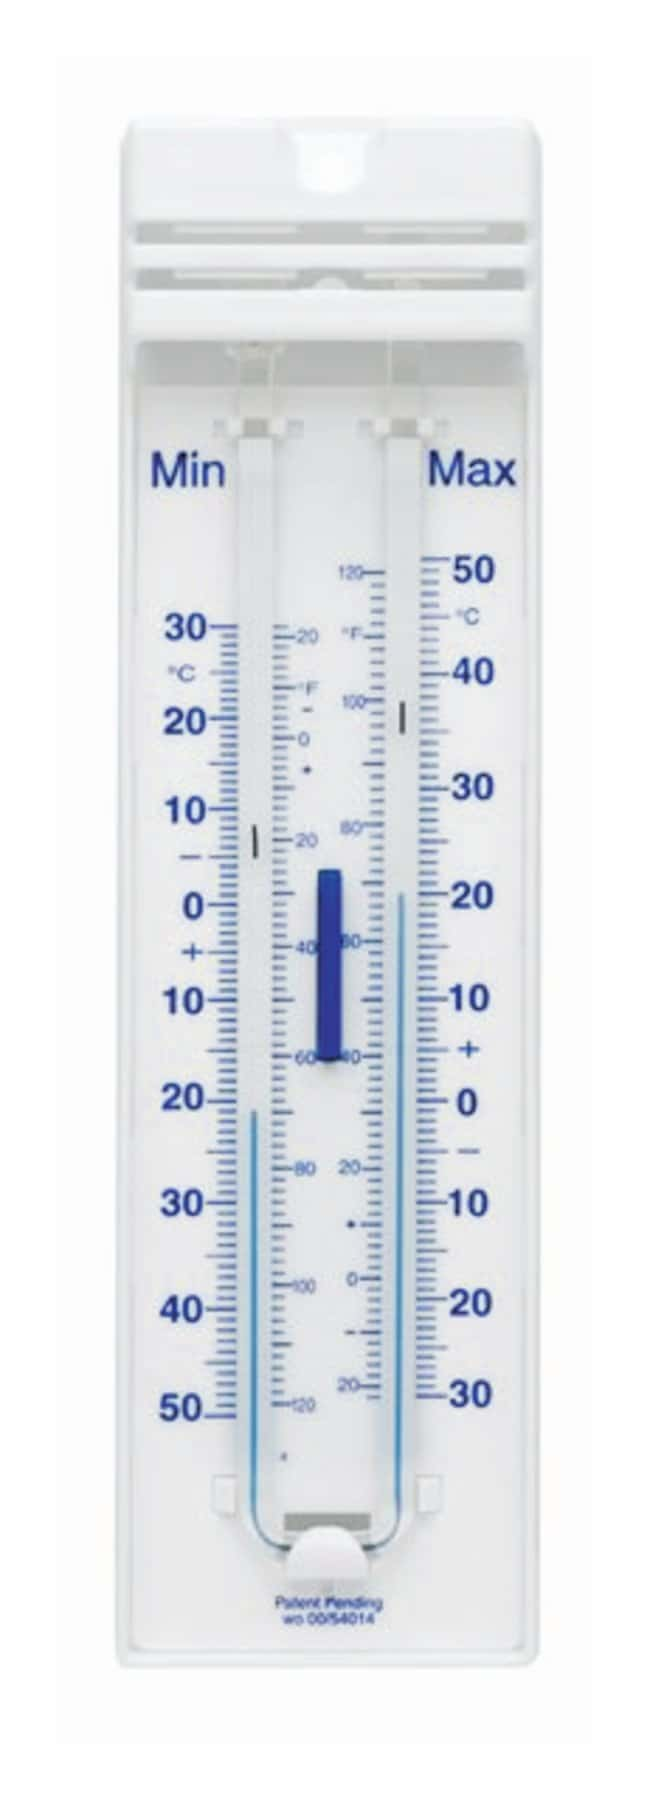 H-B InstrumentDurac Maximum/Minimum U-Shaped Thermometer Range: -35°